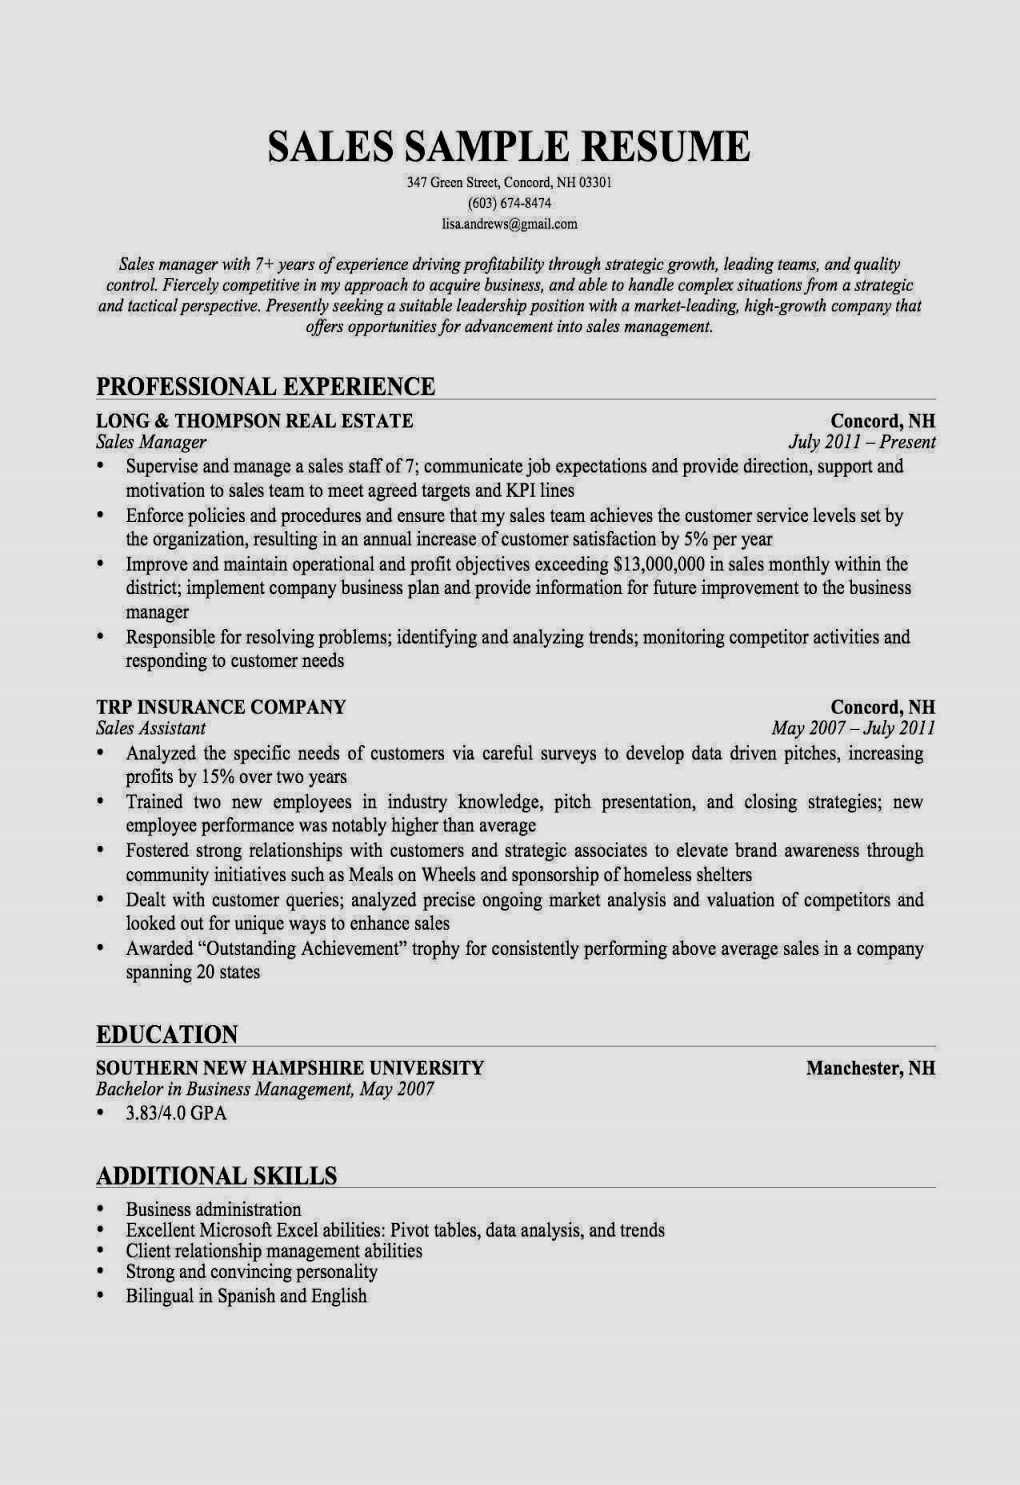 Data Analyst Resume Cover Letter Data Analyst Business Analytics Resume Sample Best How To Do A Cover Letter Cover Letter Data Analyst data analyst resume|wikiresume.com